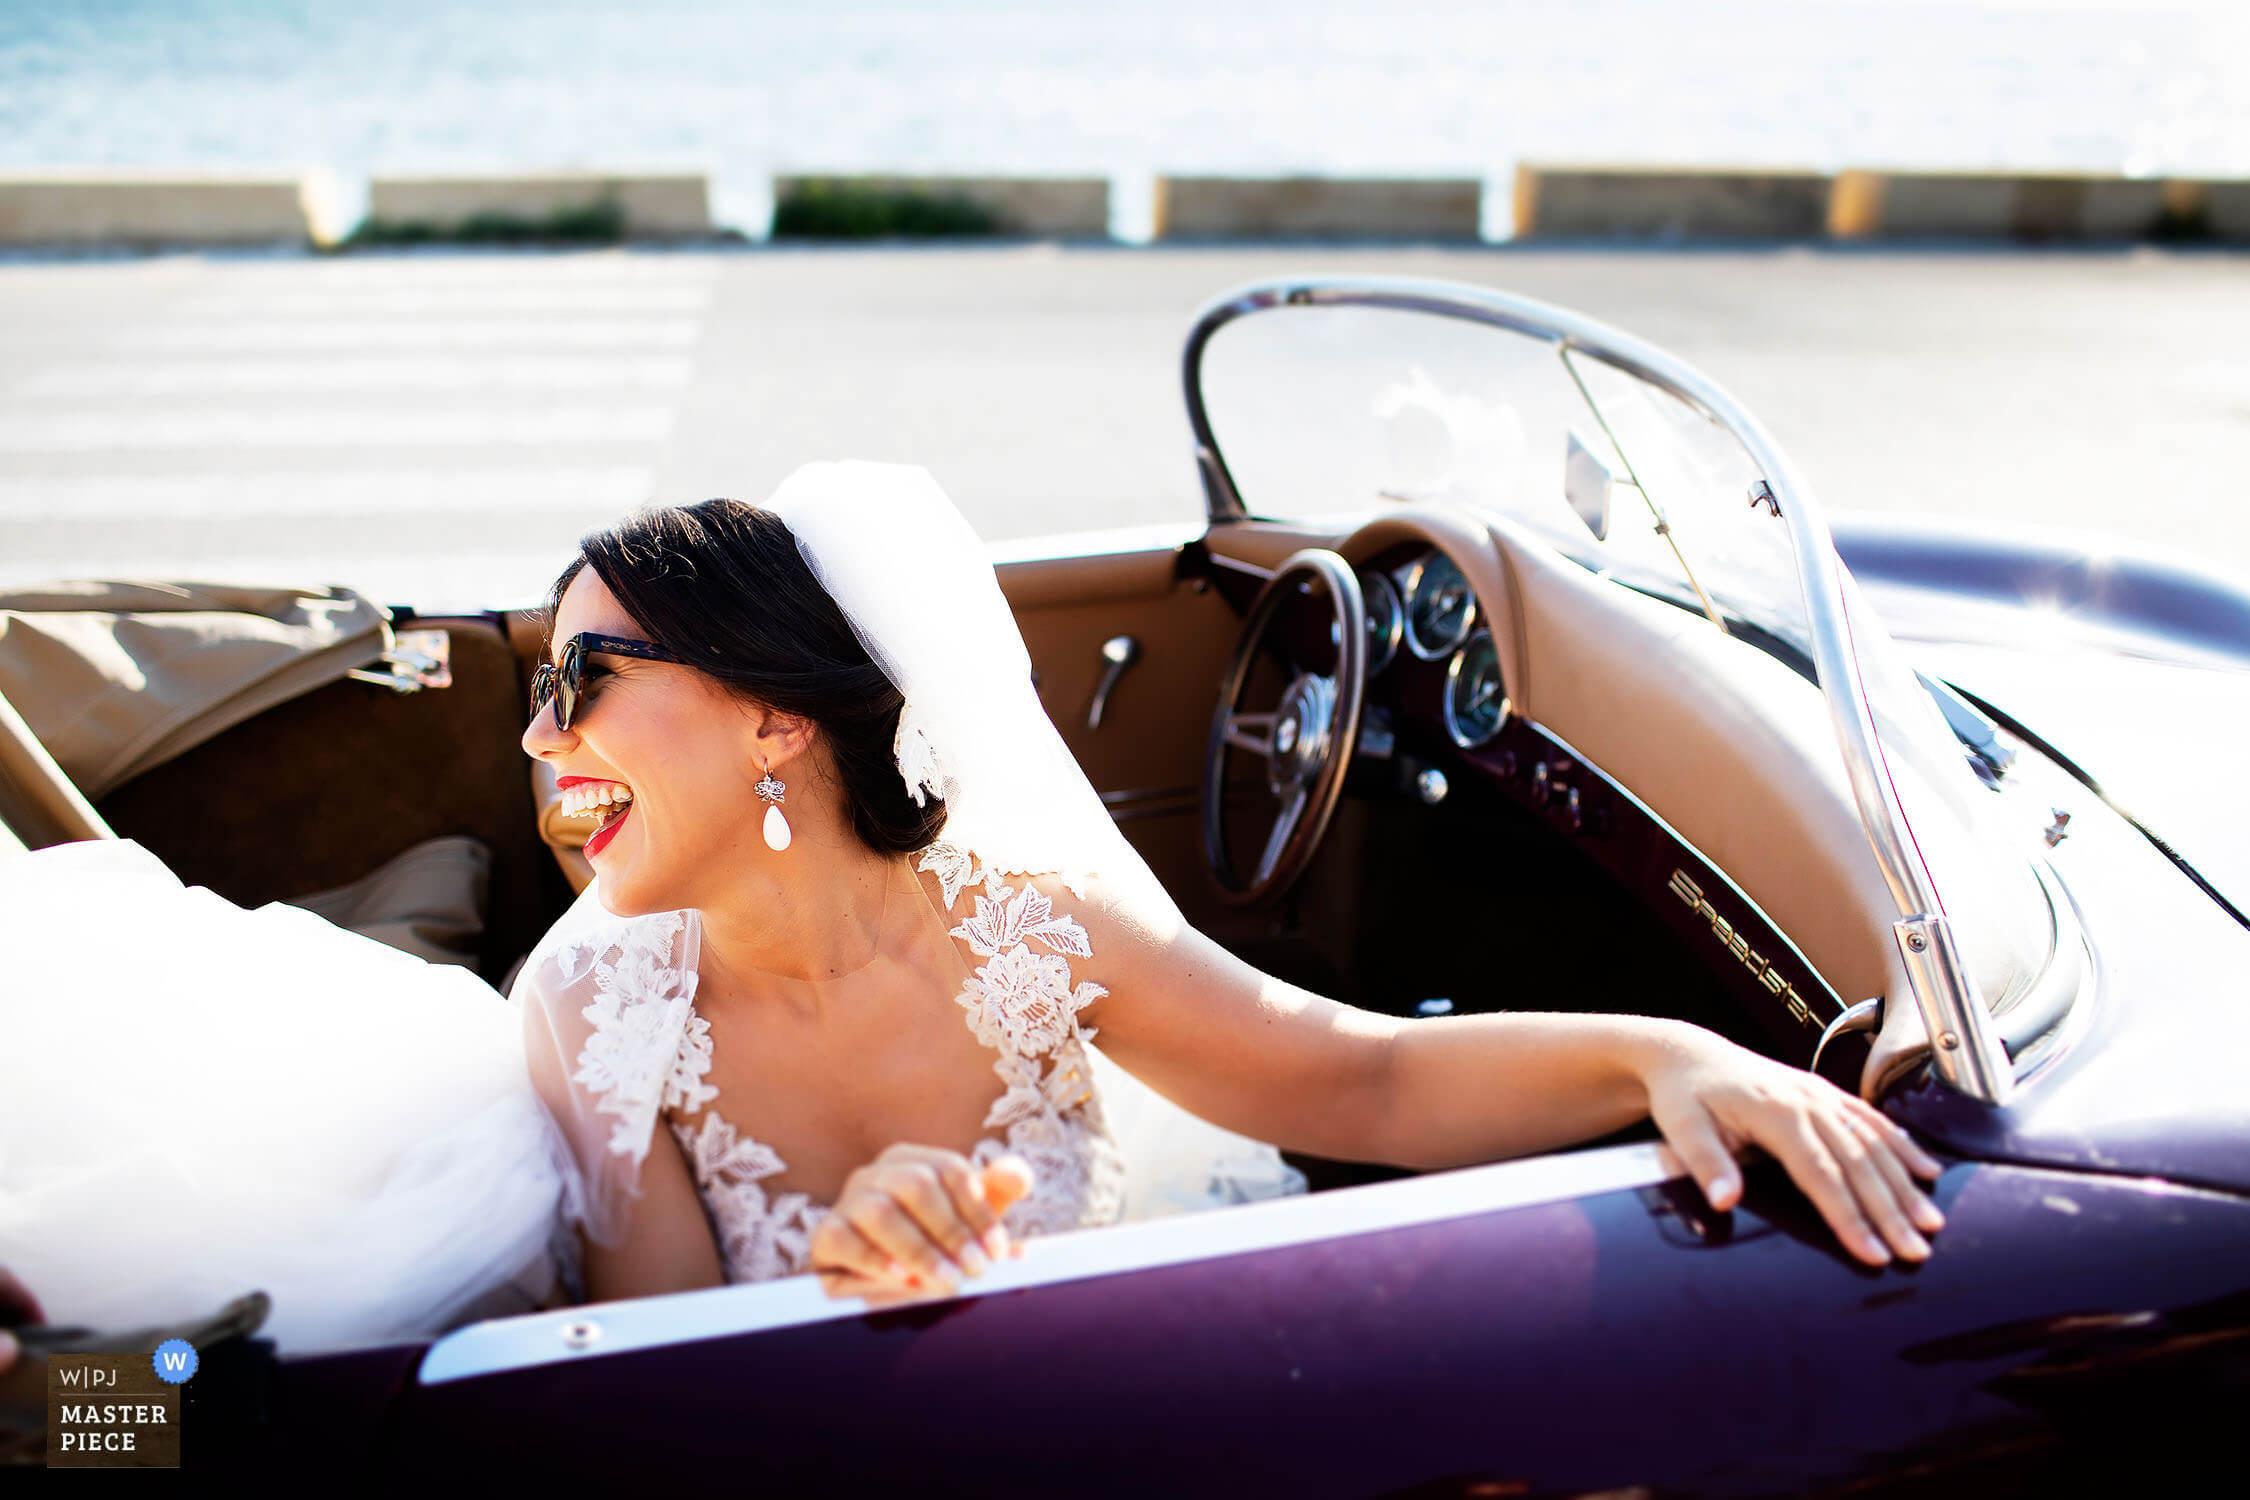 Trapani Fotografia Matrimonio Premiata WPJA - riconoscimenti fotografie matrimonio